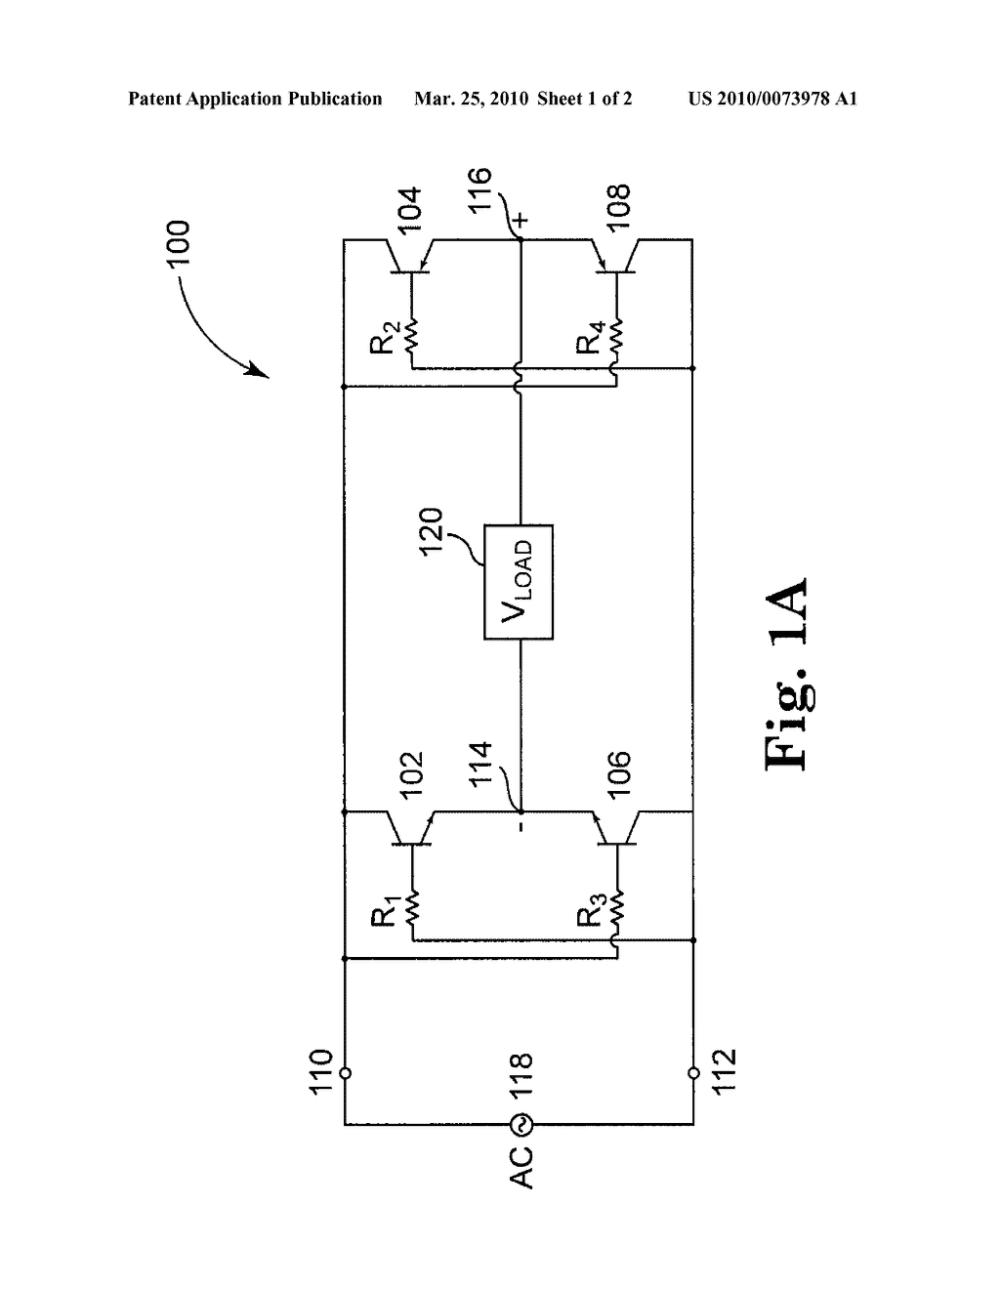 medium resolution of bridge rectifier circuit with bipolar transistors diagram schematic and image 02